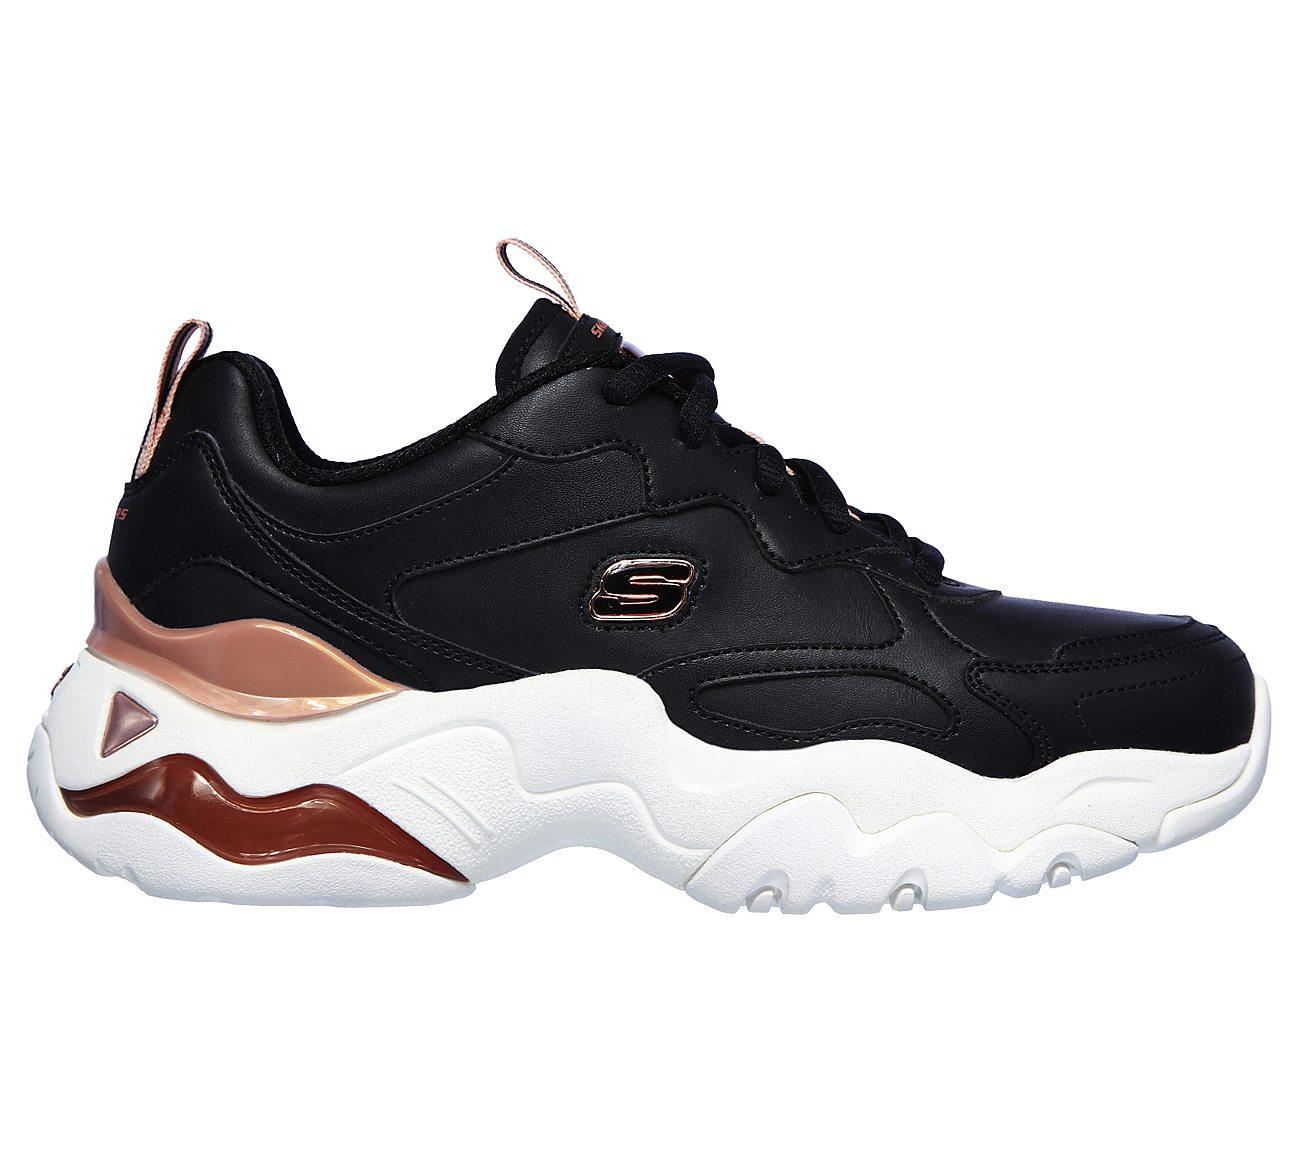 Empotrar estómago Centro de niños  Buy SKECHERS D'Lites 3.0 Air - Golden Rules D'Lites Shoes